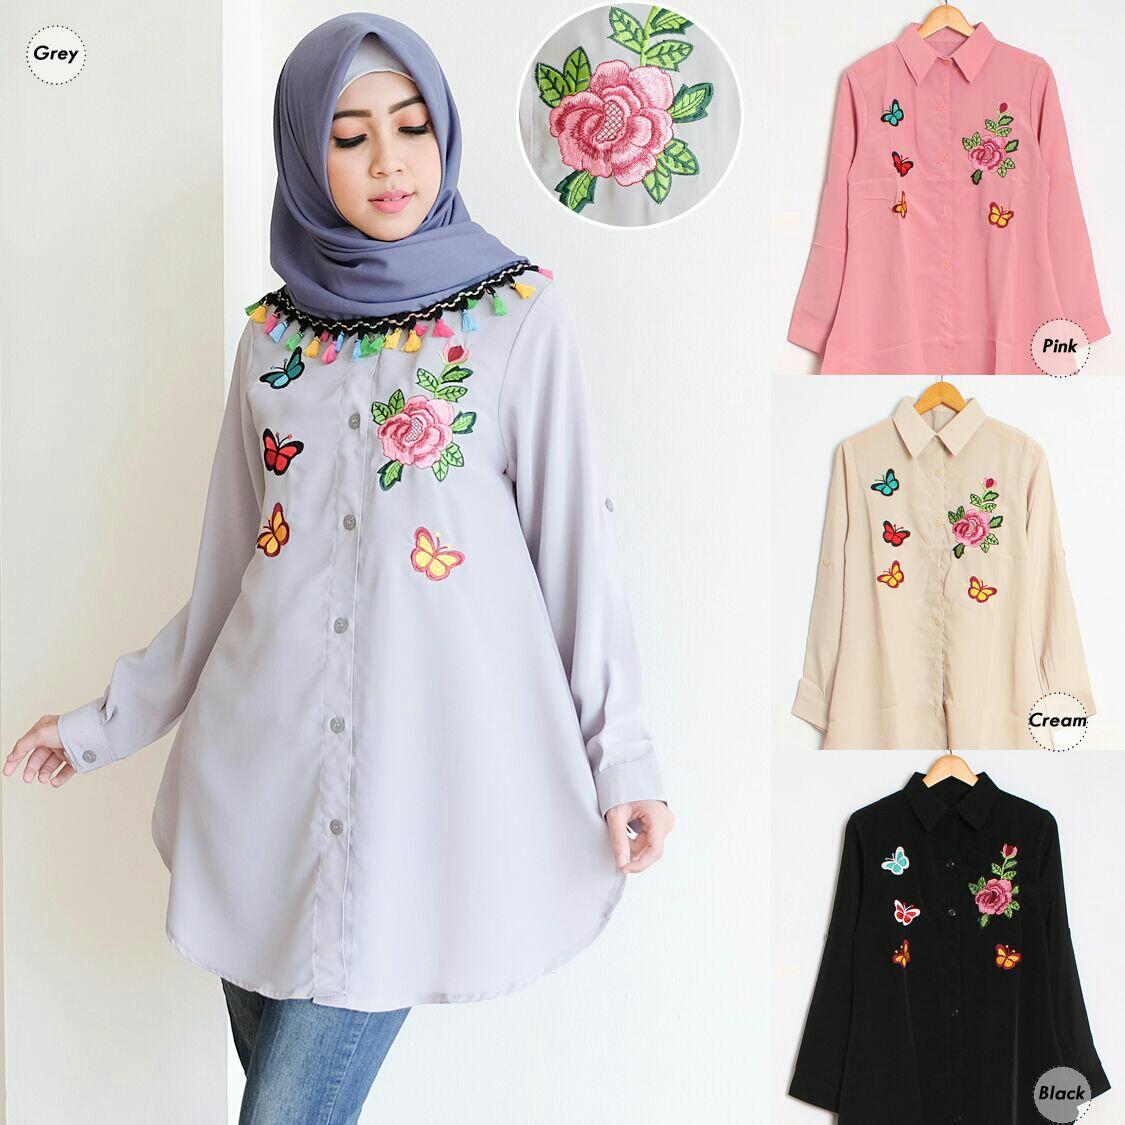 Baju Atasan Tunik Fashion Hijab Lengan Panjang Cantik Model Terbaru